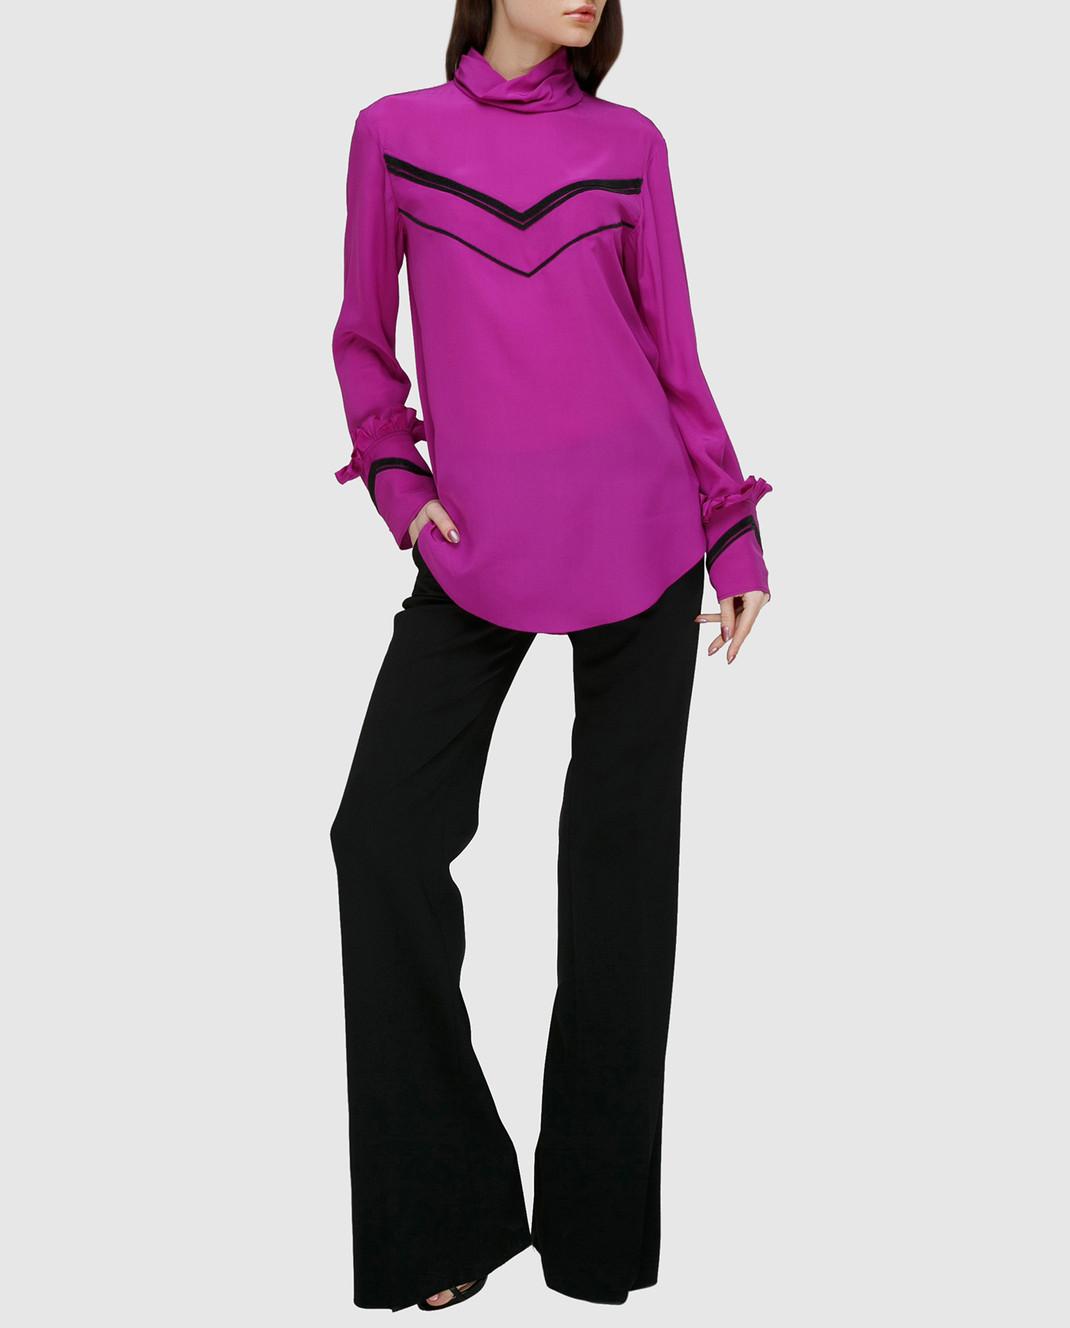 NINA RICCI Розовая блуза из шелка 17PCTO016SE0801 изображение 2